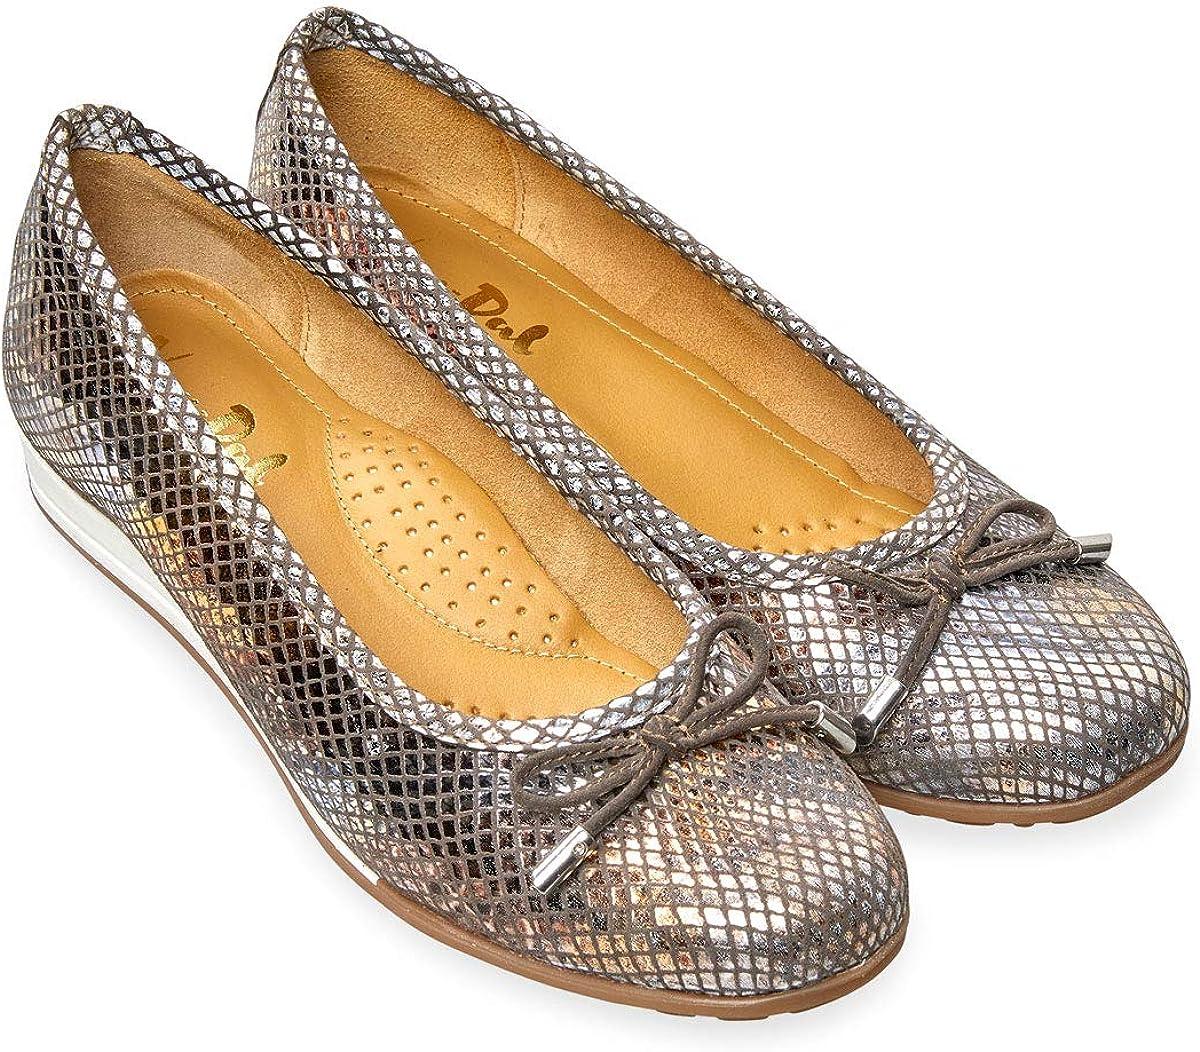 Van Dal Womens Medford Leather Ballet Pumps